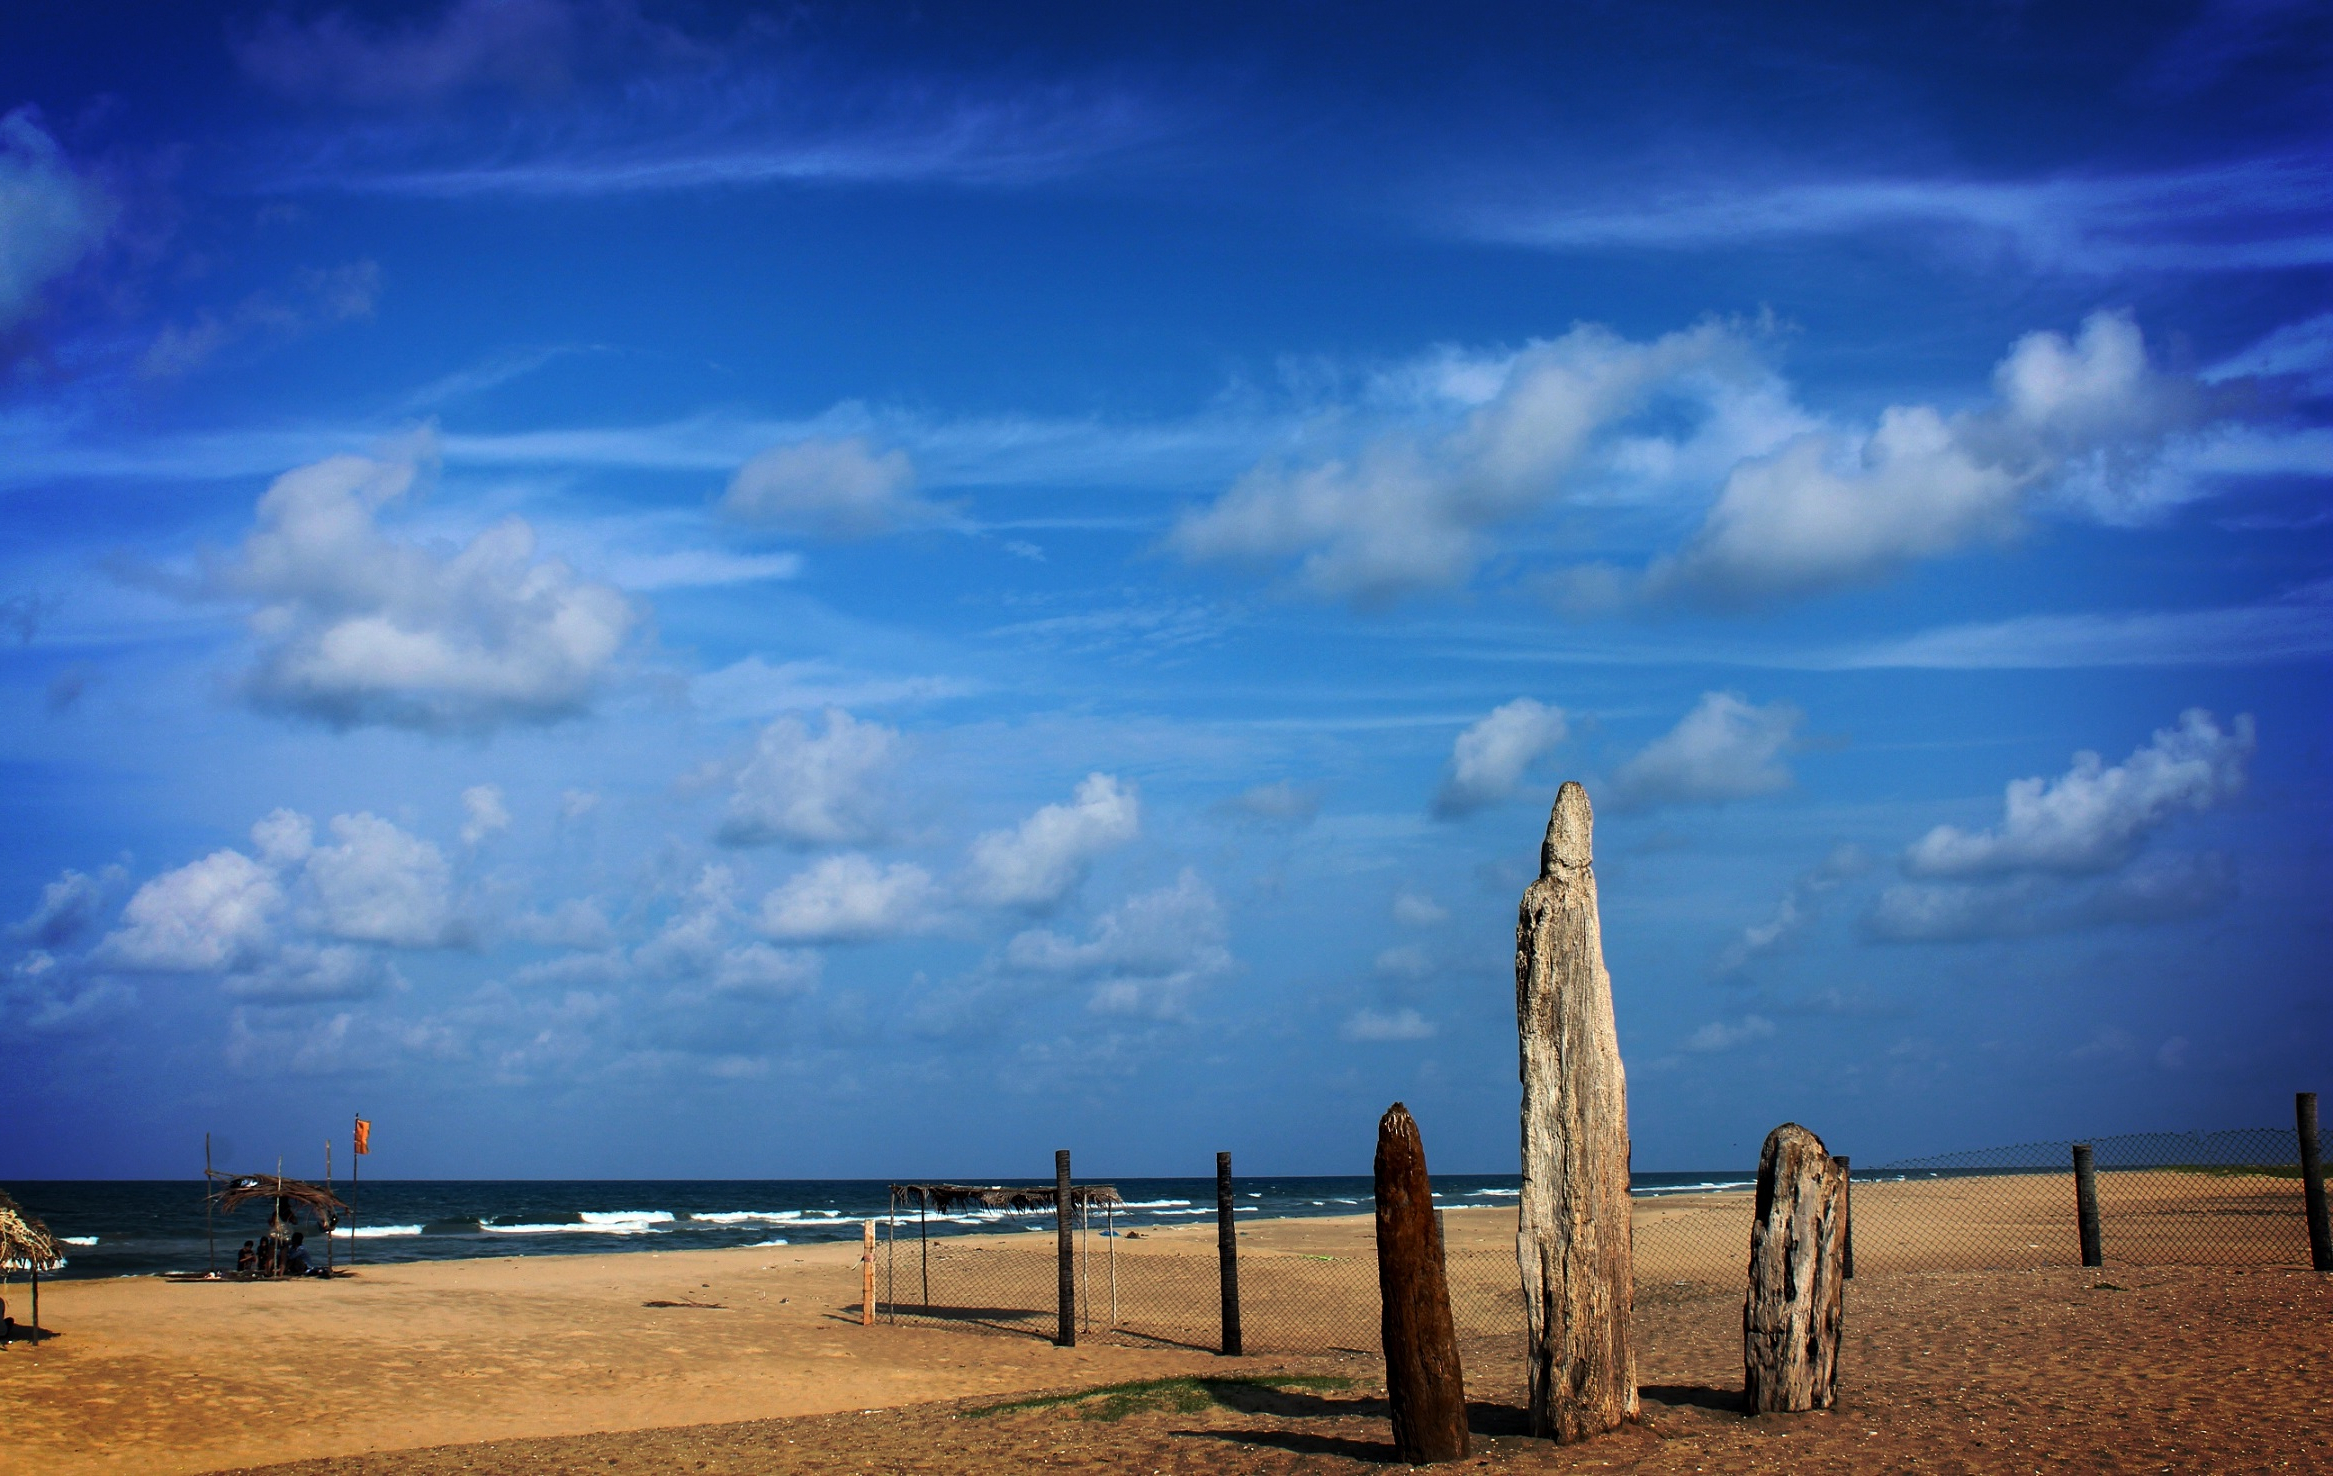 My Travel Accessories With Regard To Auriville Beach Umbrellas (View 16 of 20)